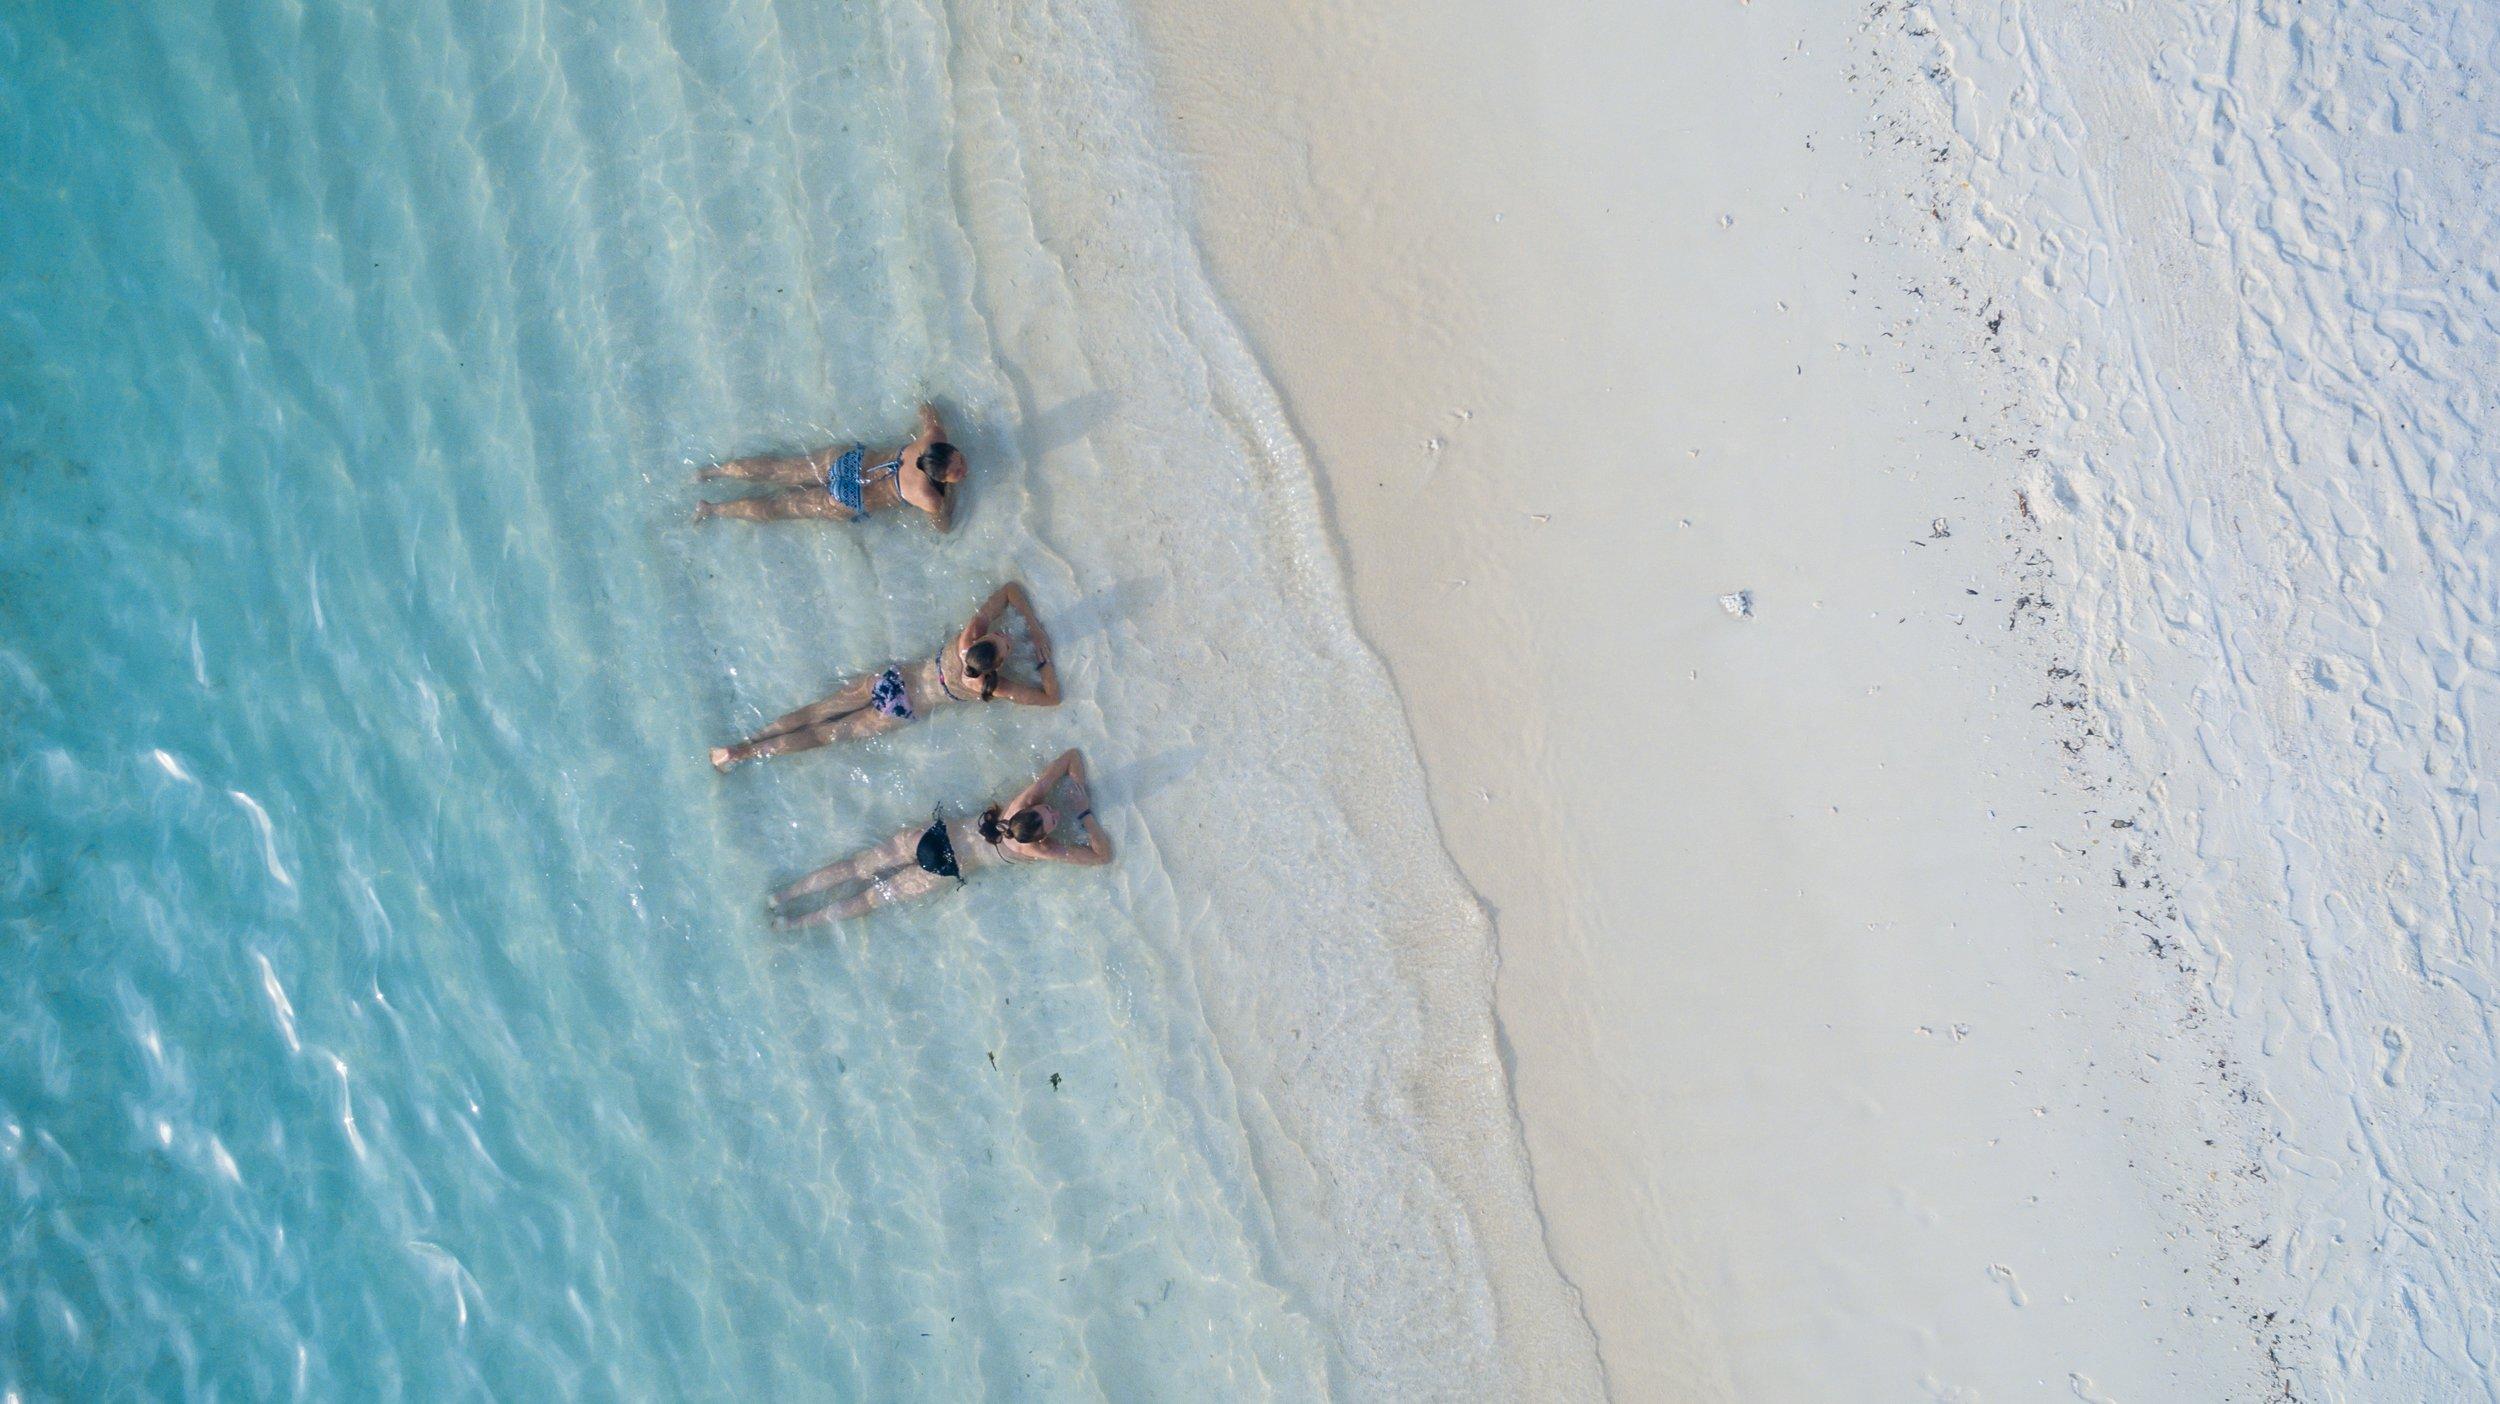 Bermuda - Peak Season: May-OctVibe: #Beach #Rest&Relaxation #AdventureCOMING SOON!